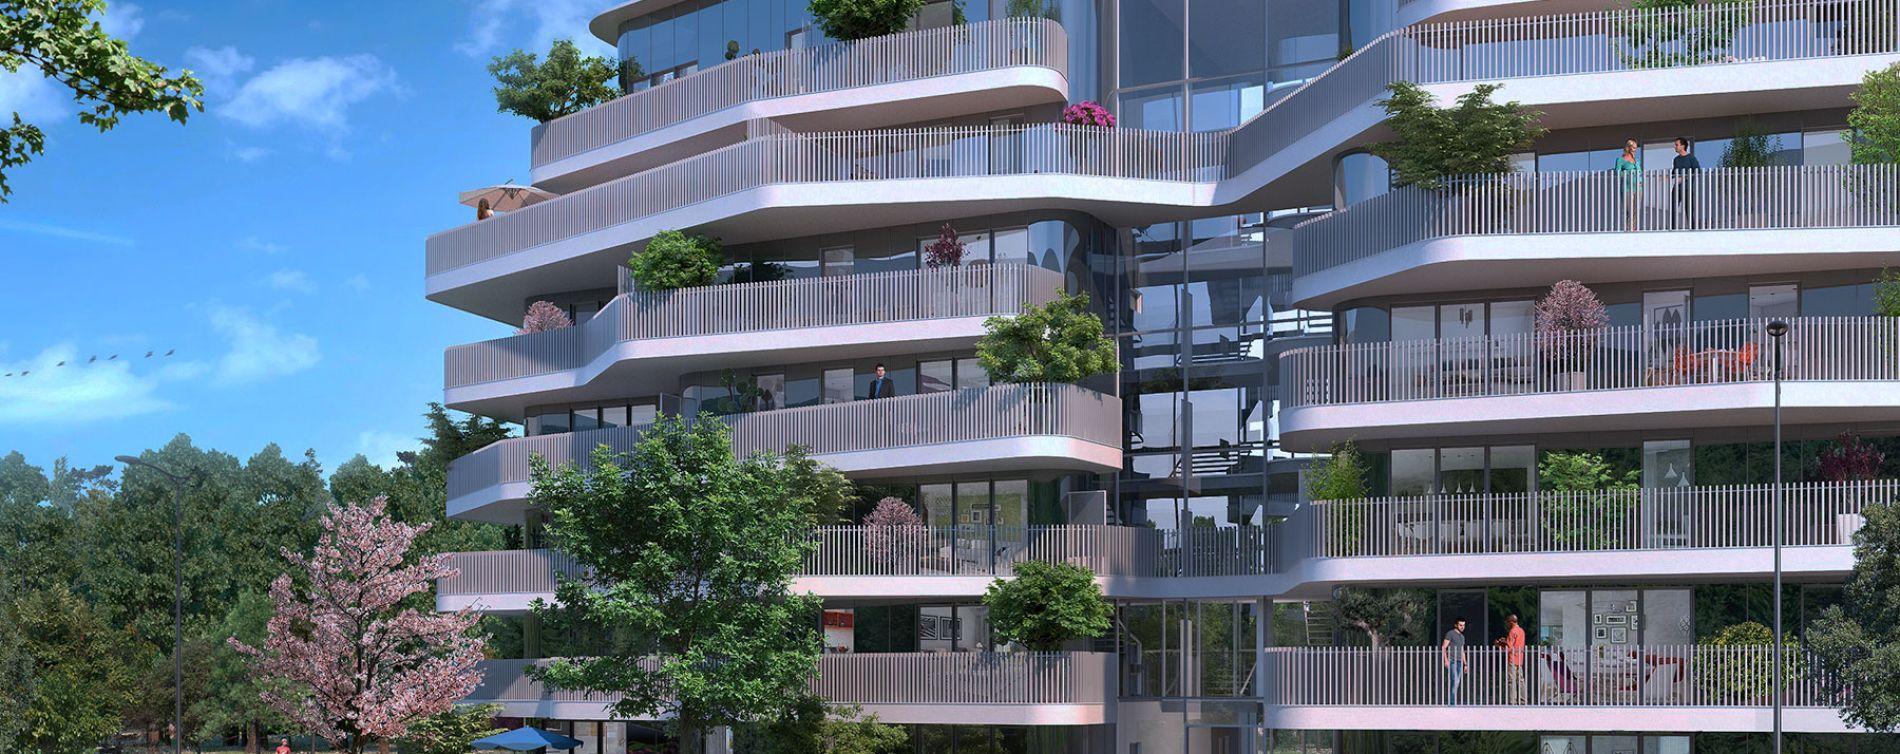 Résidence Canopée Vélizy Villacoublay à Vélizy-Villacoublay